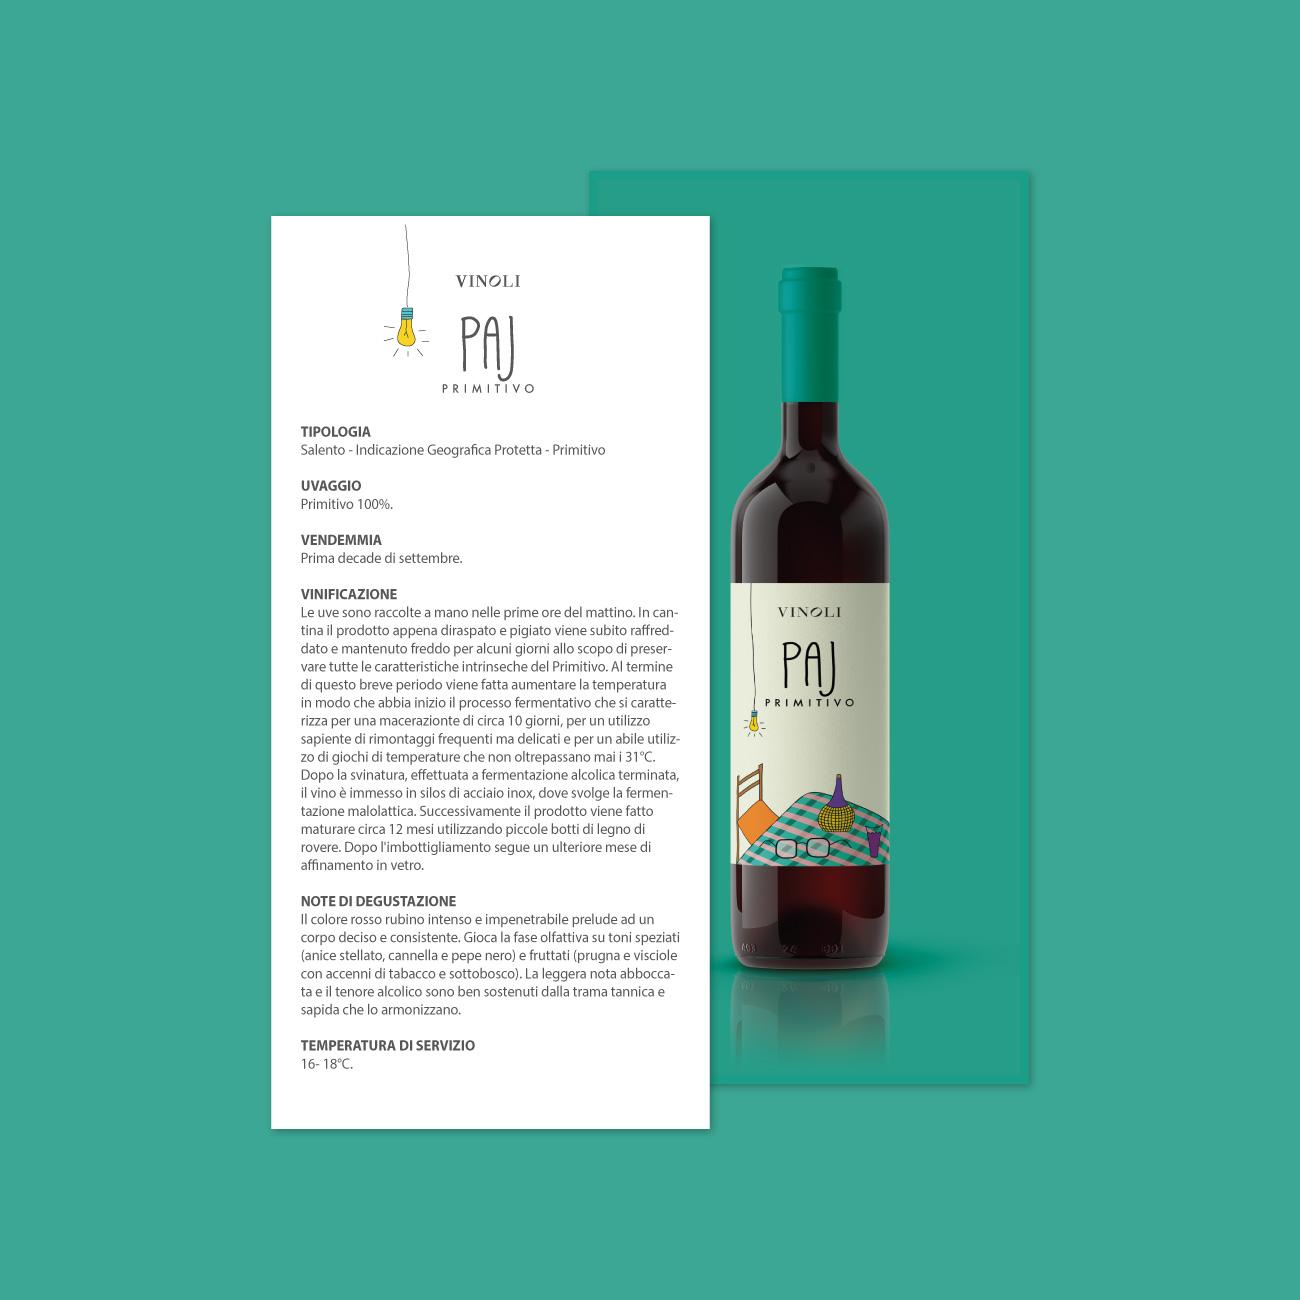 https://www.orlandinifrancesco.com/wp/wp-content/uploads/2019/07/Vinoli-Scheda-Tecnica-Paj-Orlandini-Francesco-2.jpg